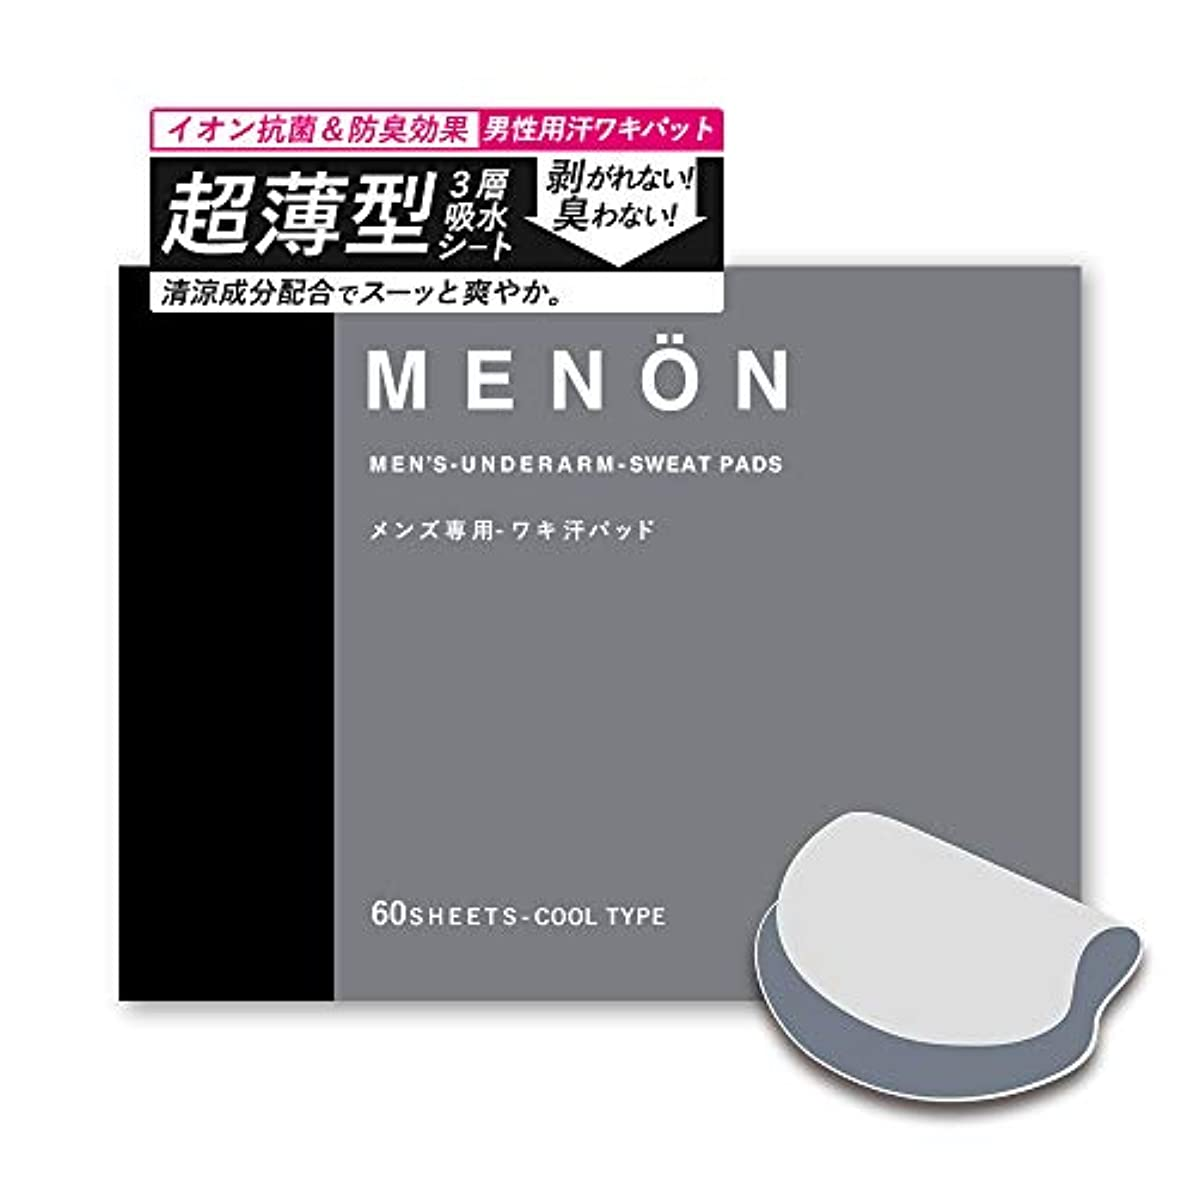 MENON 安心の日本製 脇汗パッド メンズ 使い捨て 汗取りパッド 大容量60枚 (30セット) 清涼成分配合 脇汗 男性用 ボディケア 汗ジミ?臭い予防に パッド シール メノン